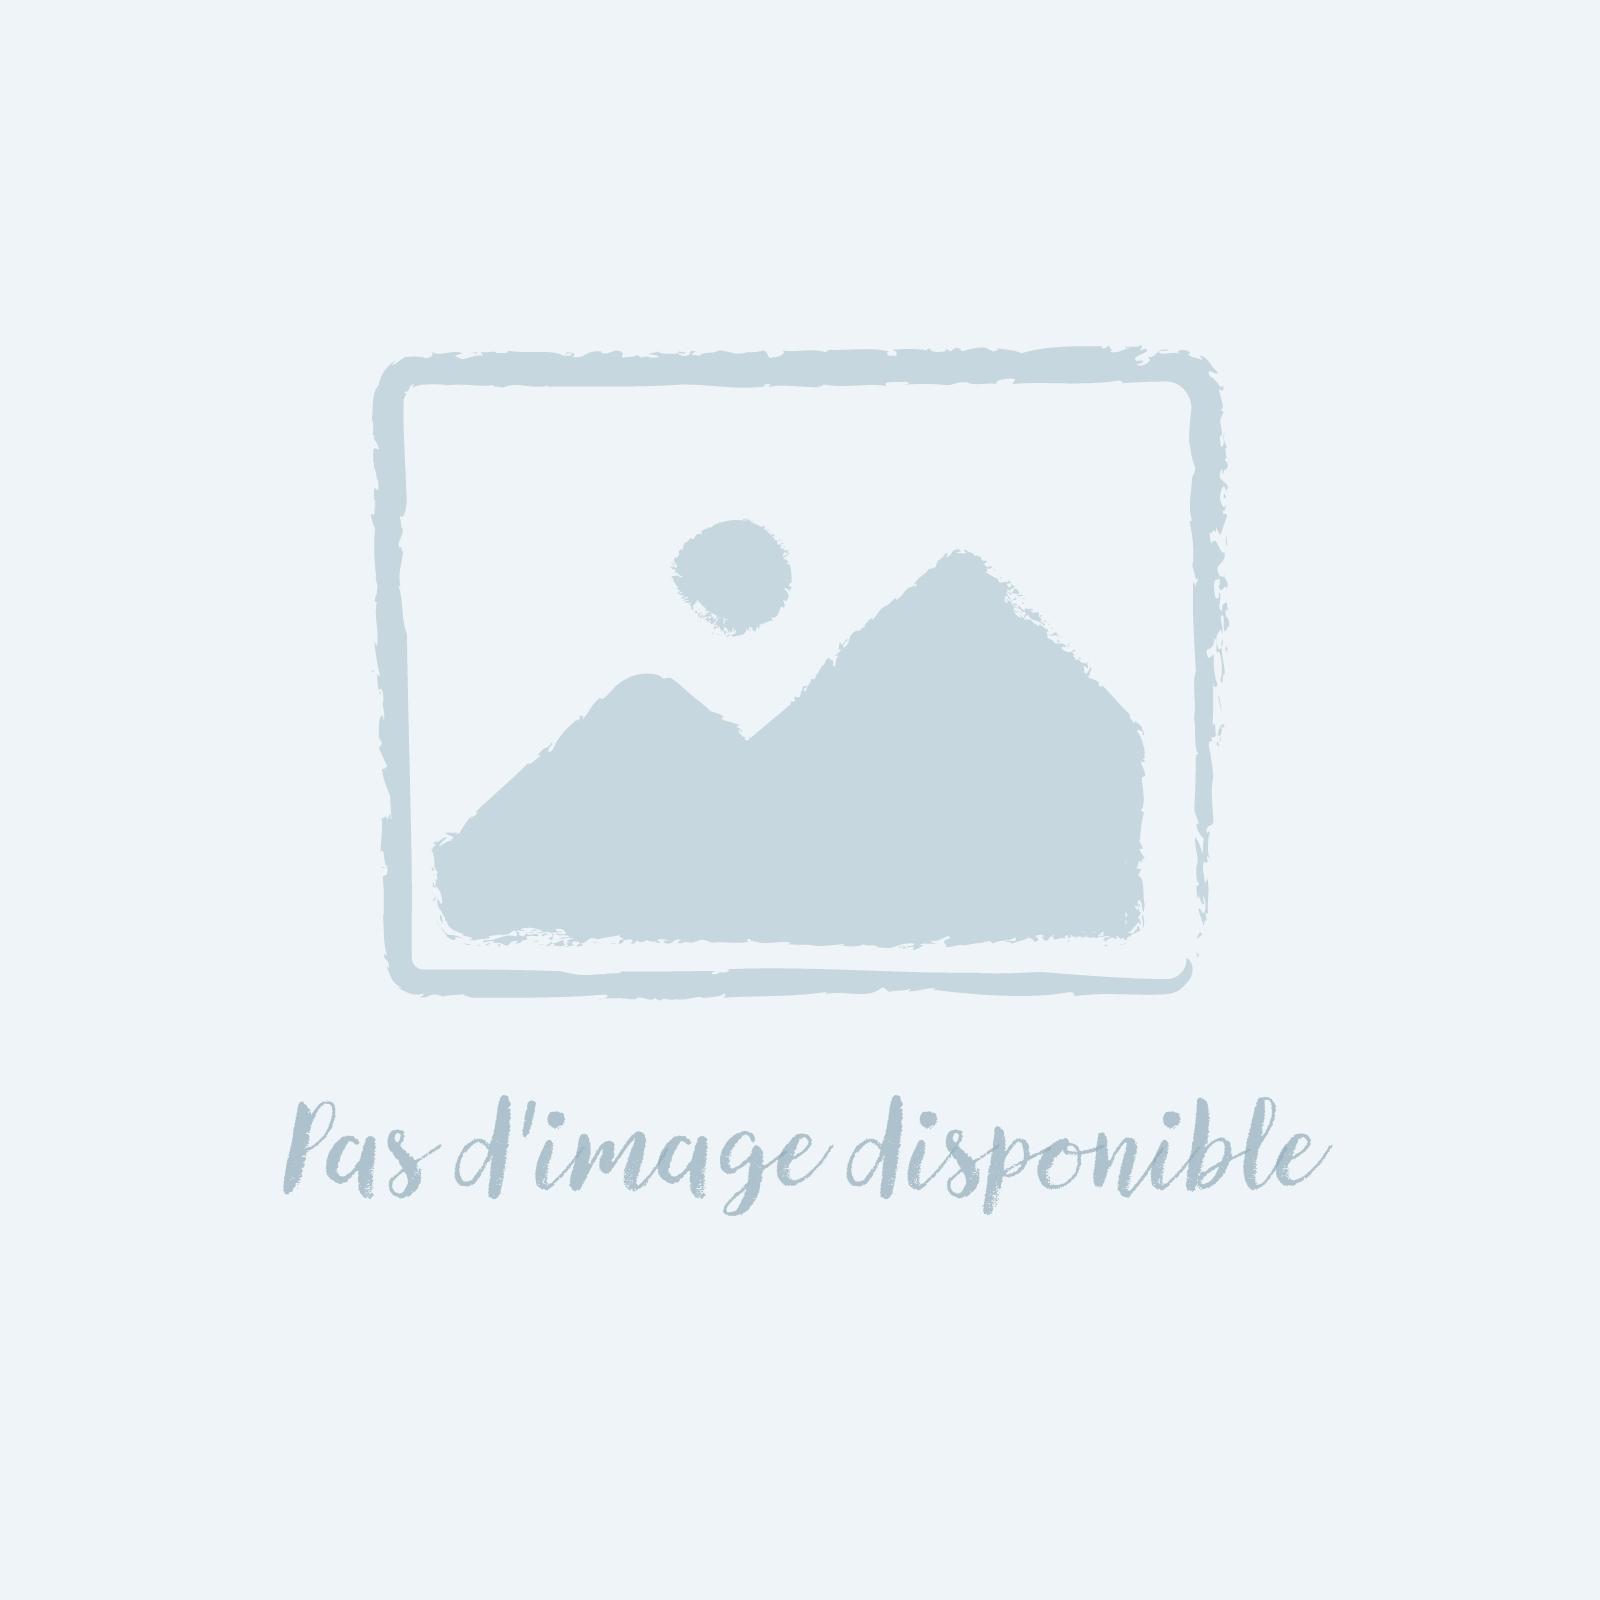 "Gerflor Creation 70 Clic System ""0324 Silversands"" - Lame PVC clipsable"